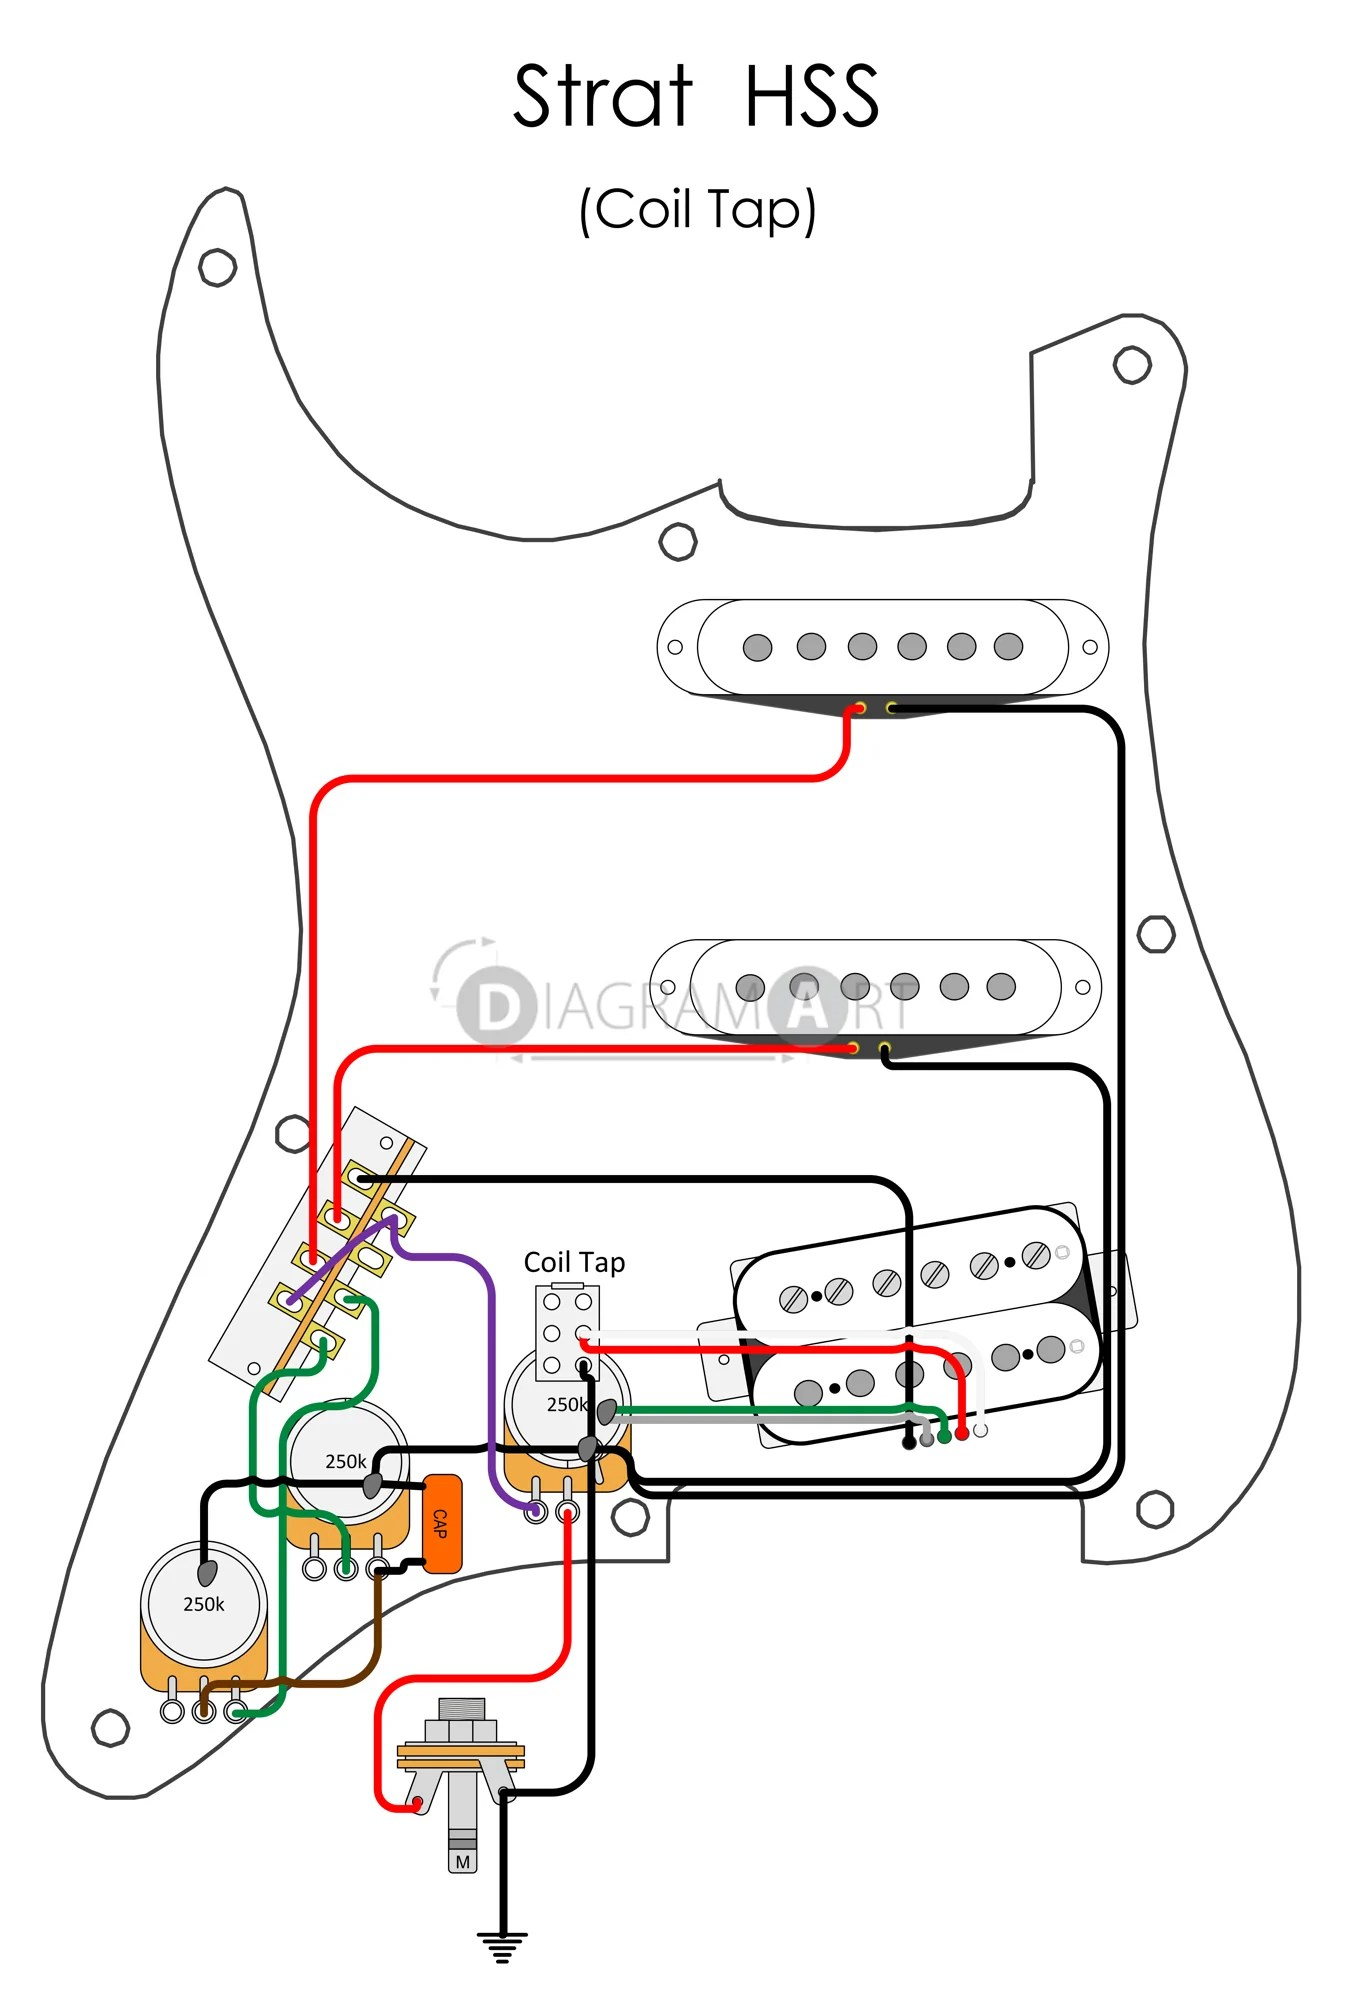 coil wiring diagram hss 5 way splitter wiring diagram for you wiring hss fender tone master [ 1348 x 2000 Pixel ]